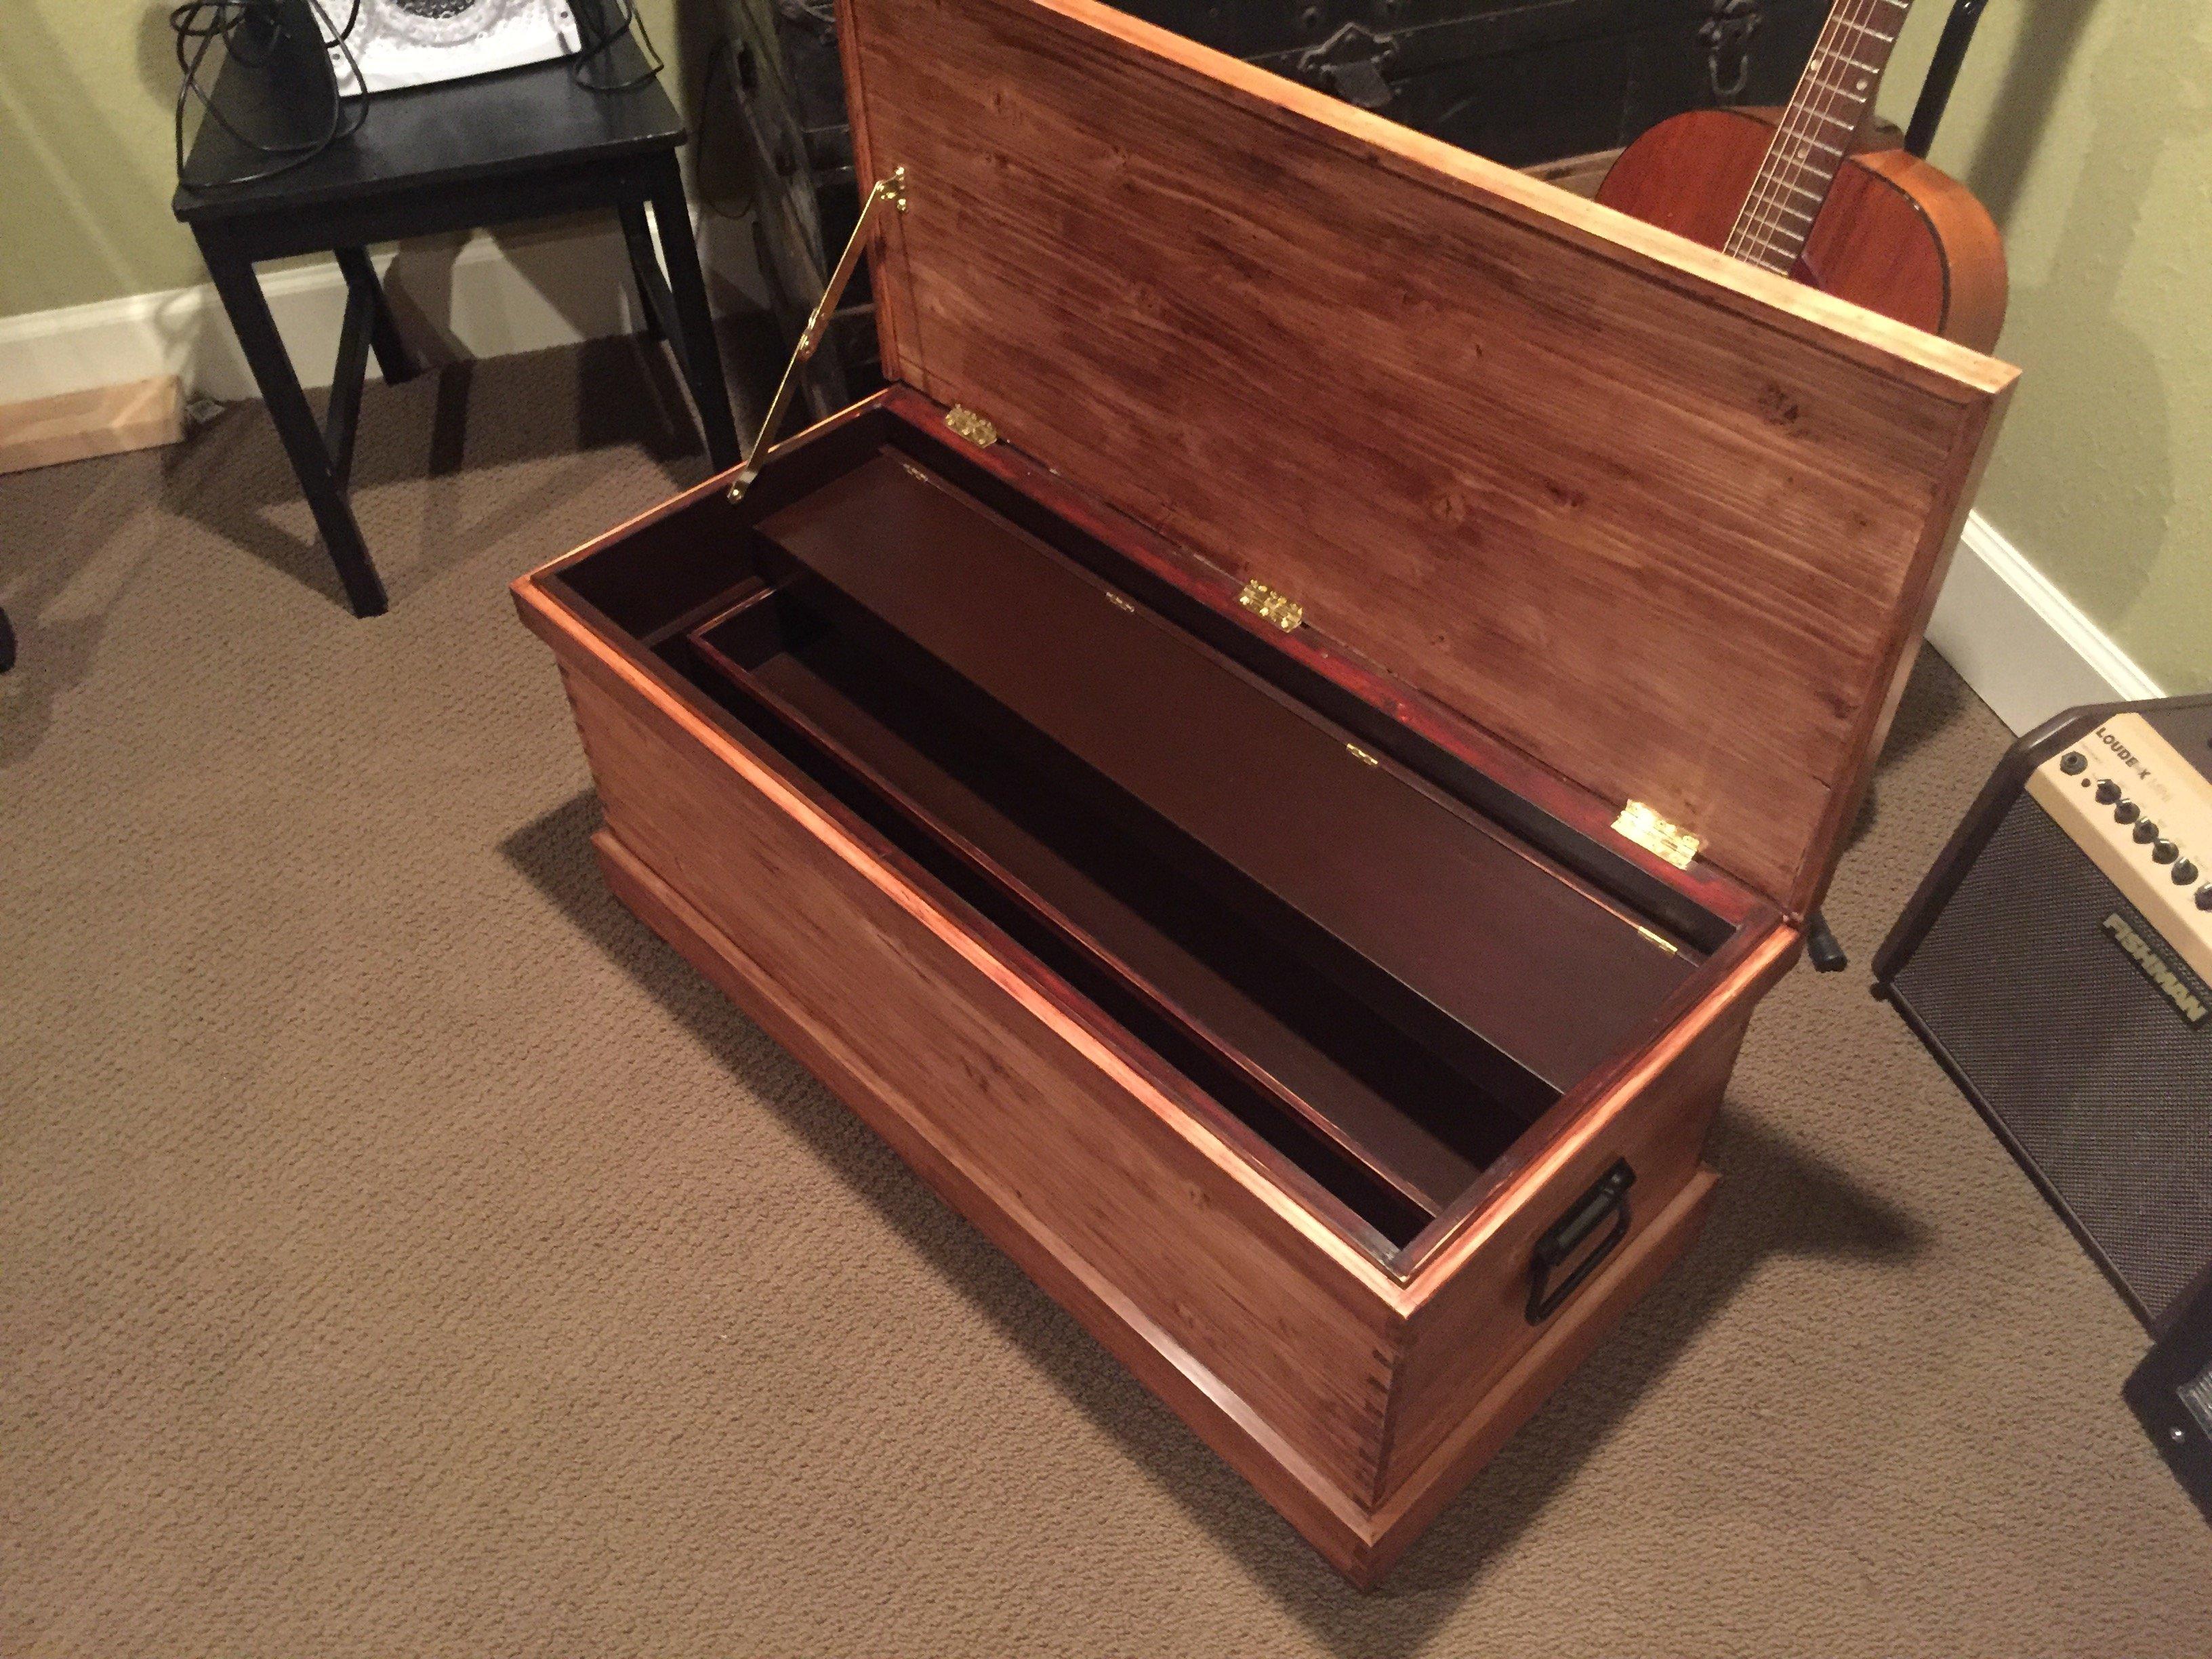 Joiner's Toolbox by joeblues79